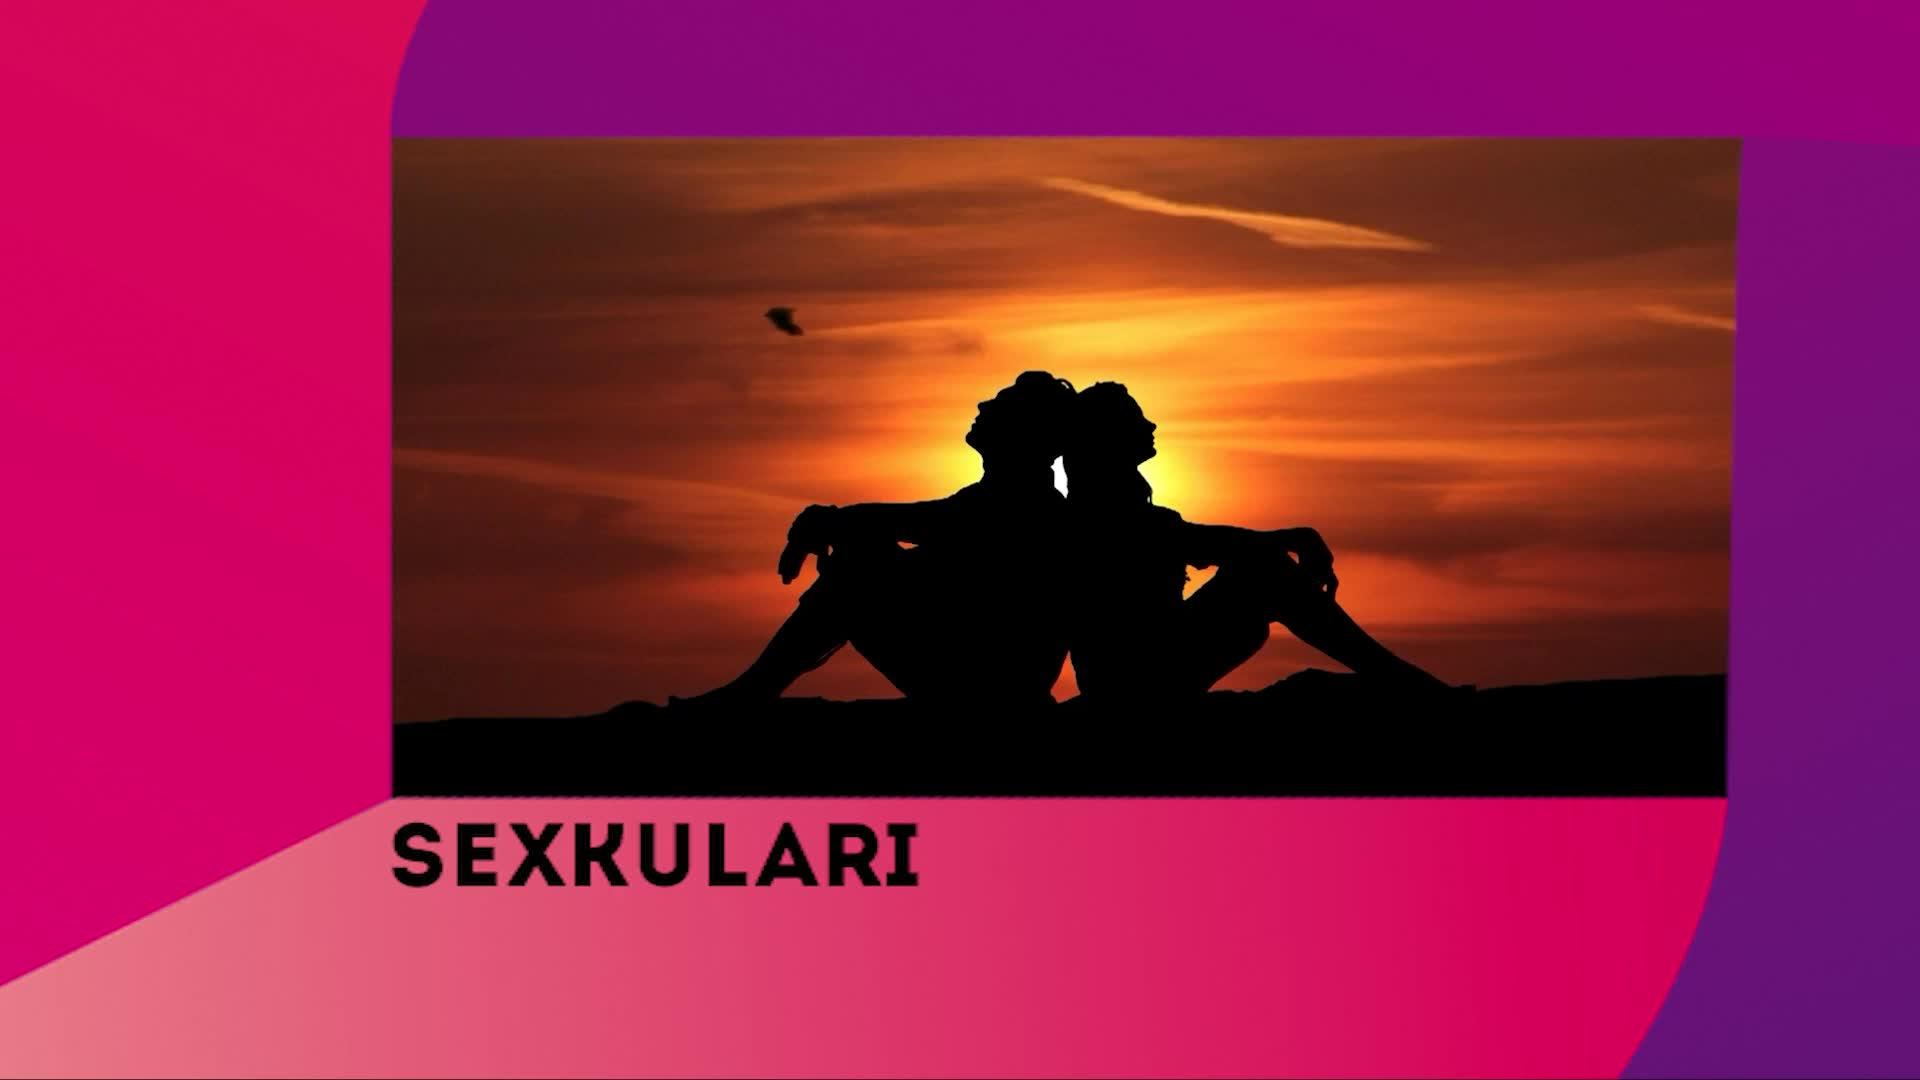 Sexkulari, Desira sexuala